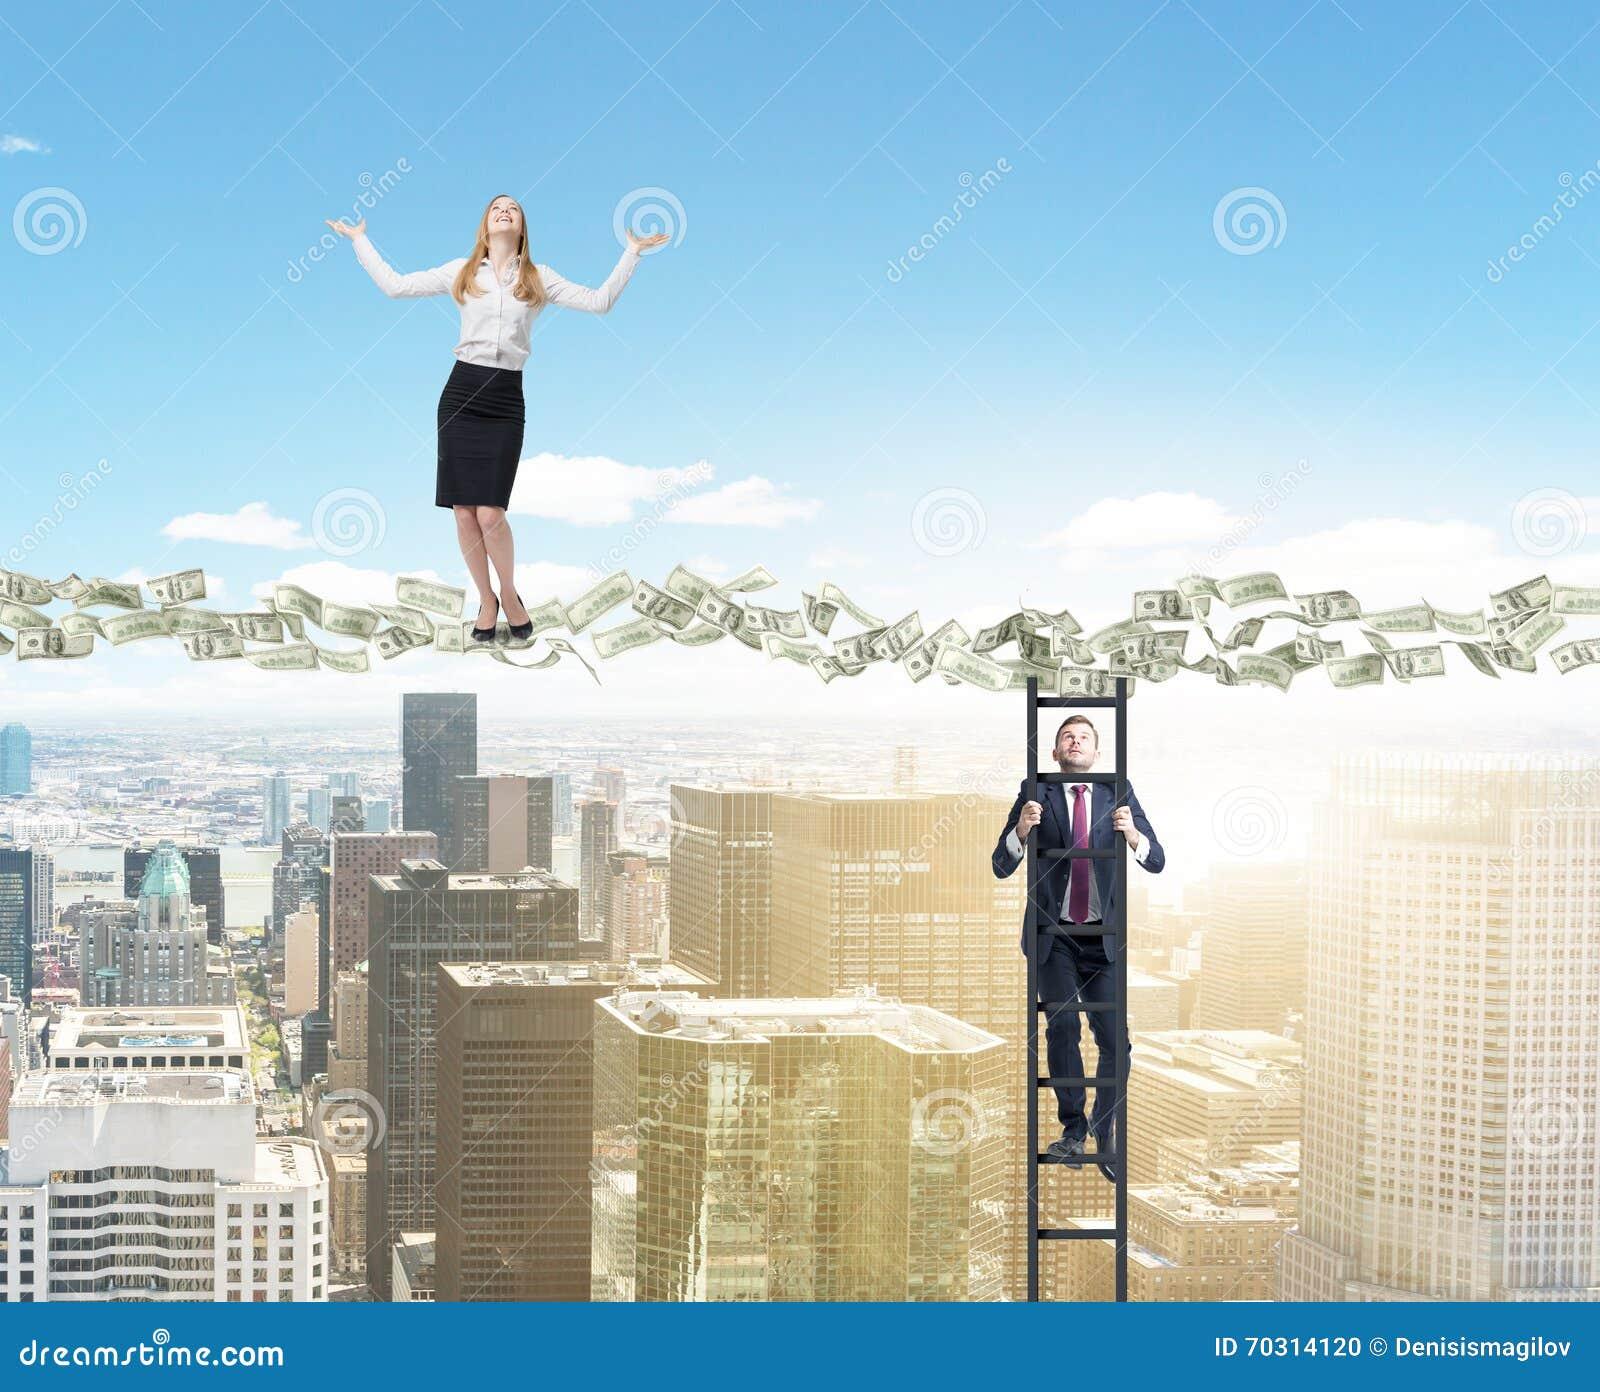 Dollar path businesspeople